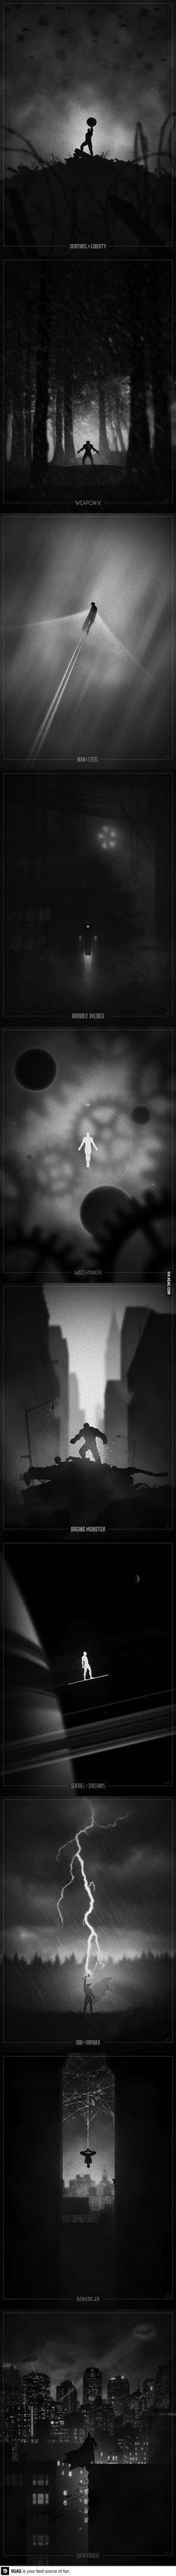 Superheroes Poster Conceptos